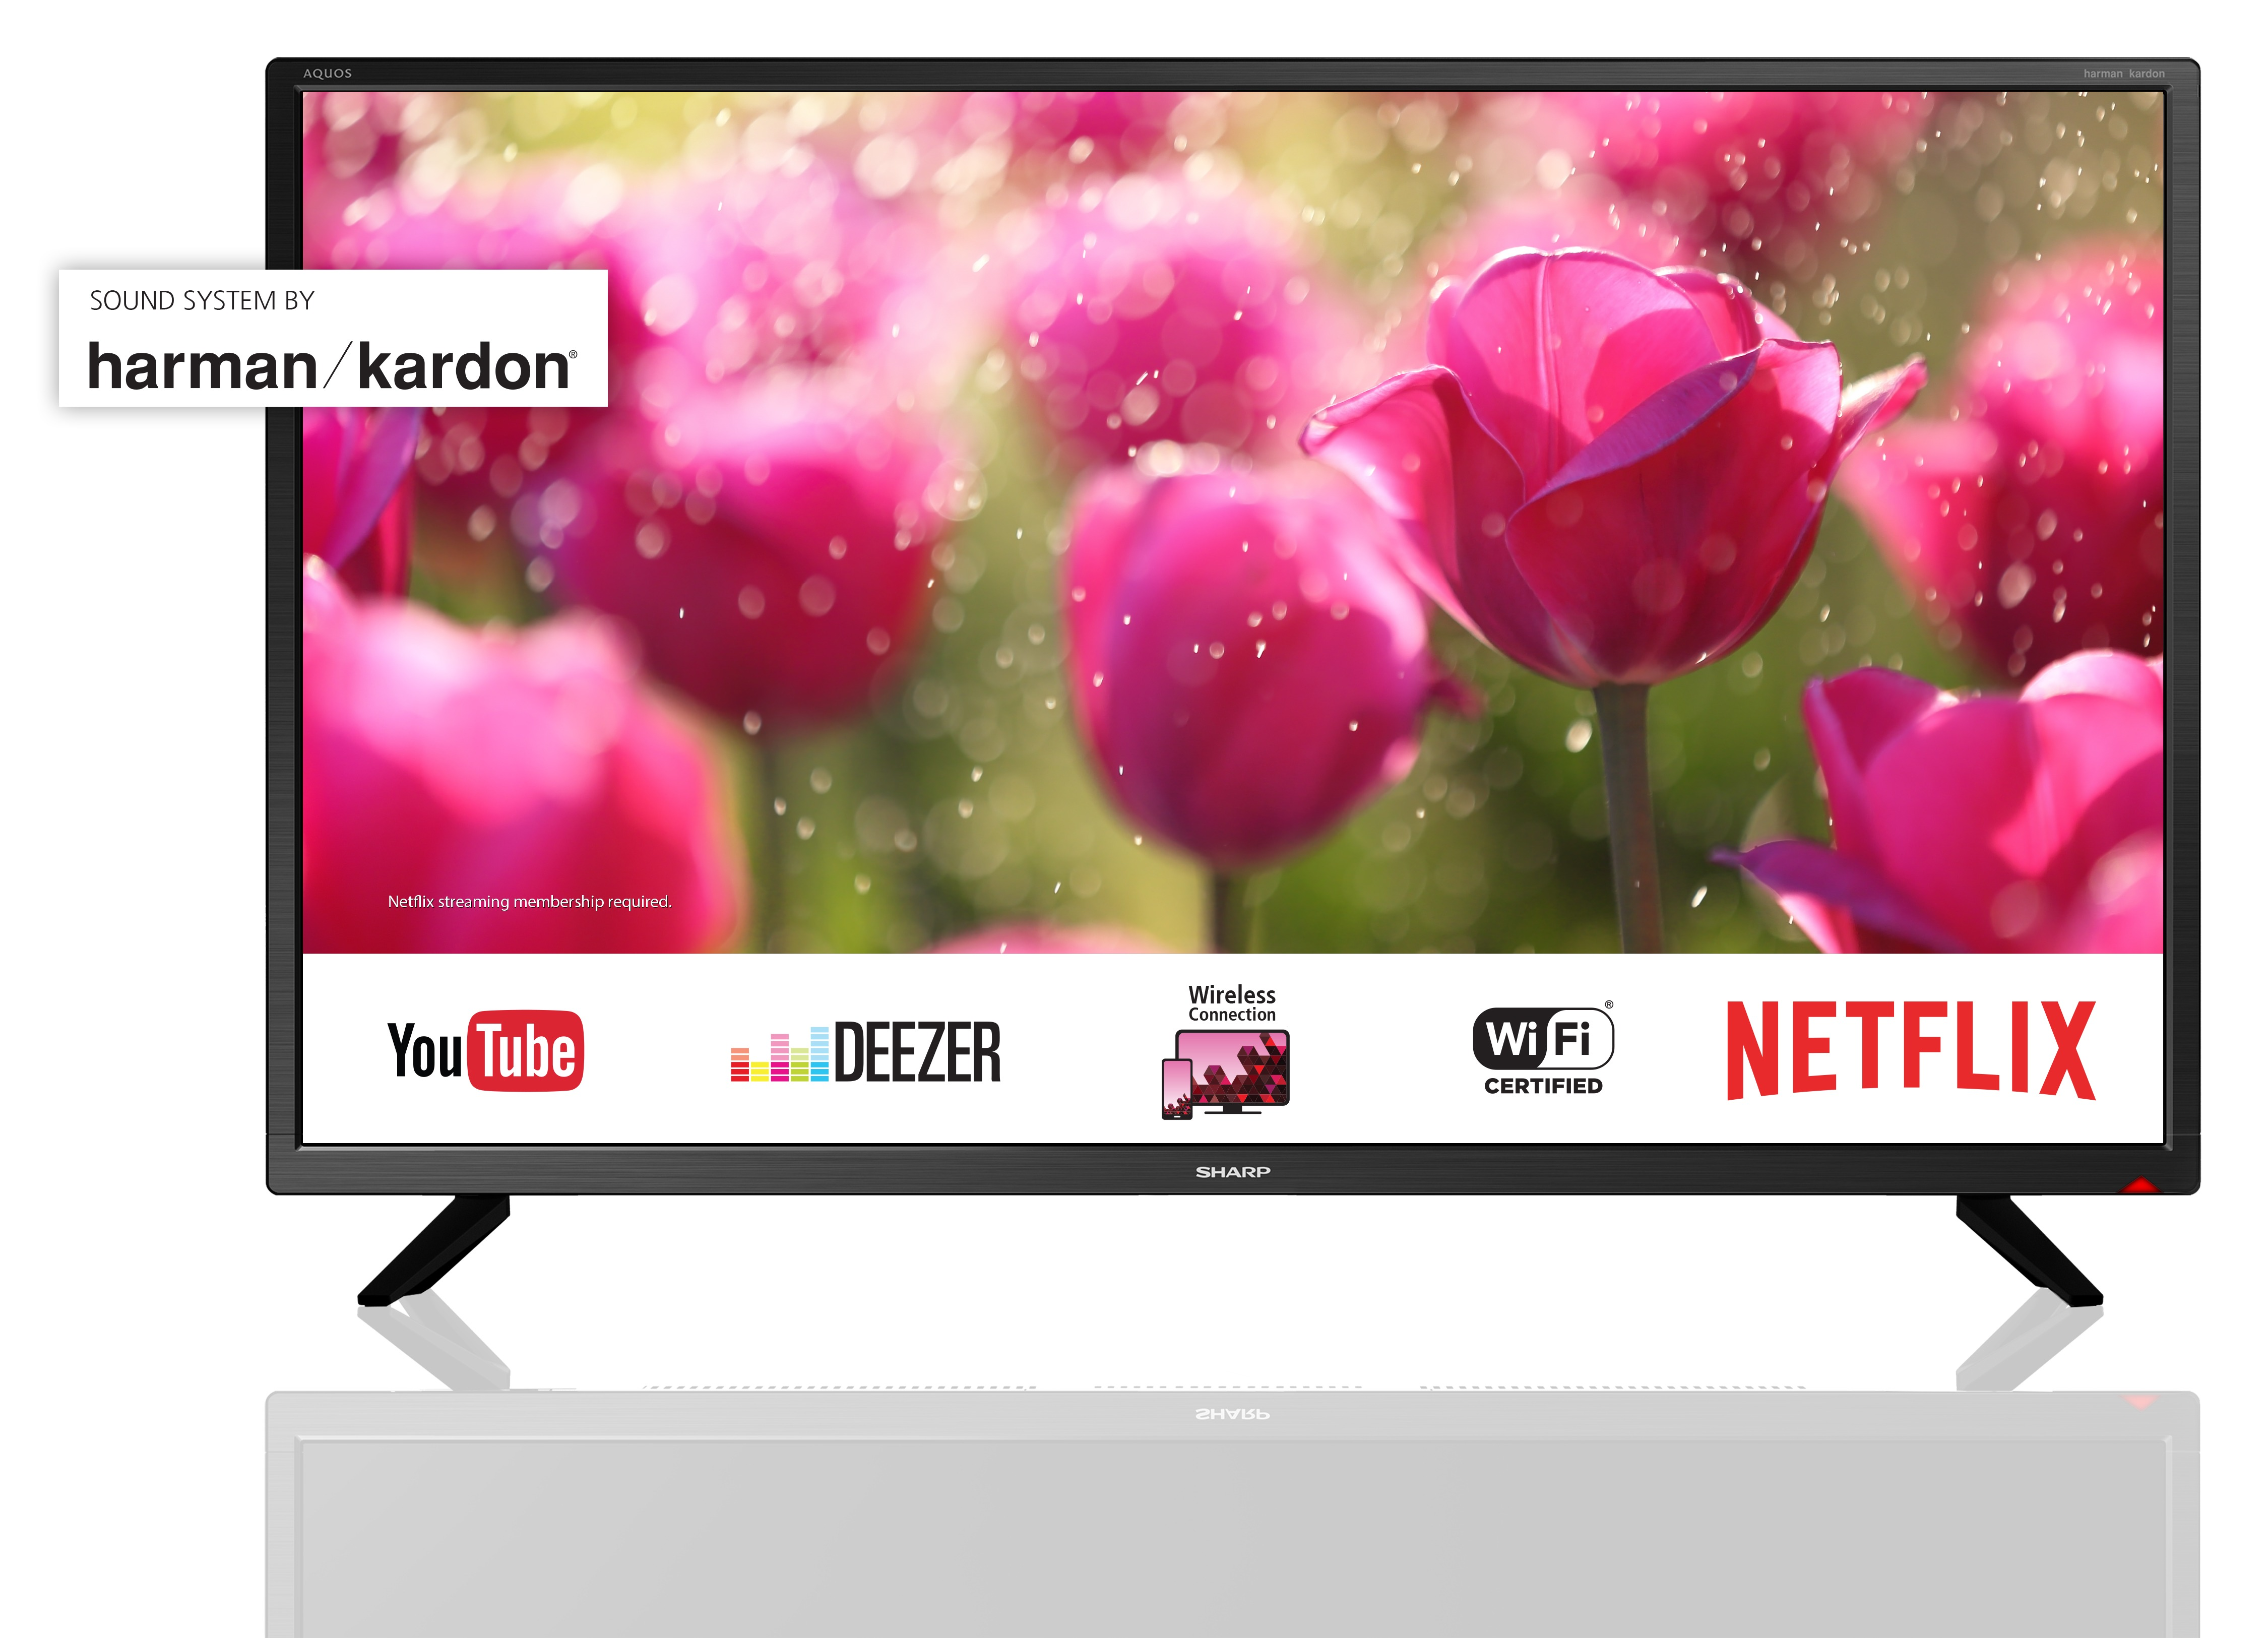 Sharp 50BJ2 50 inch UHD TV